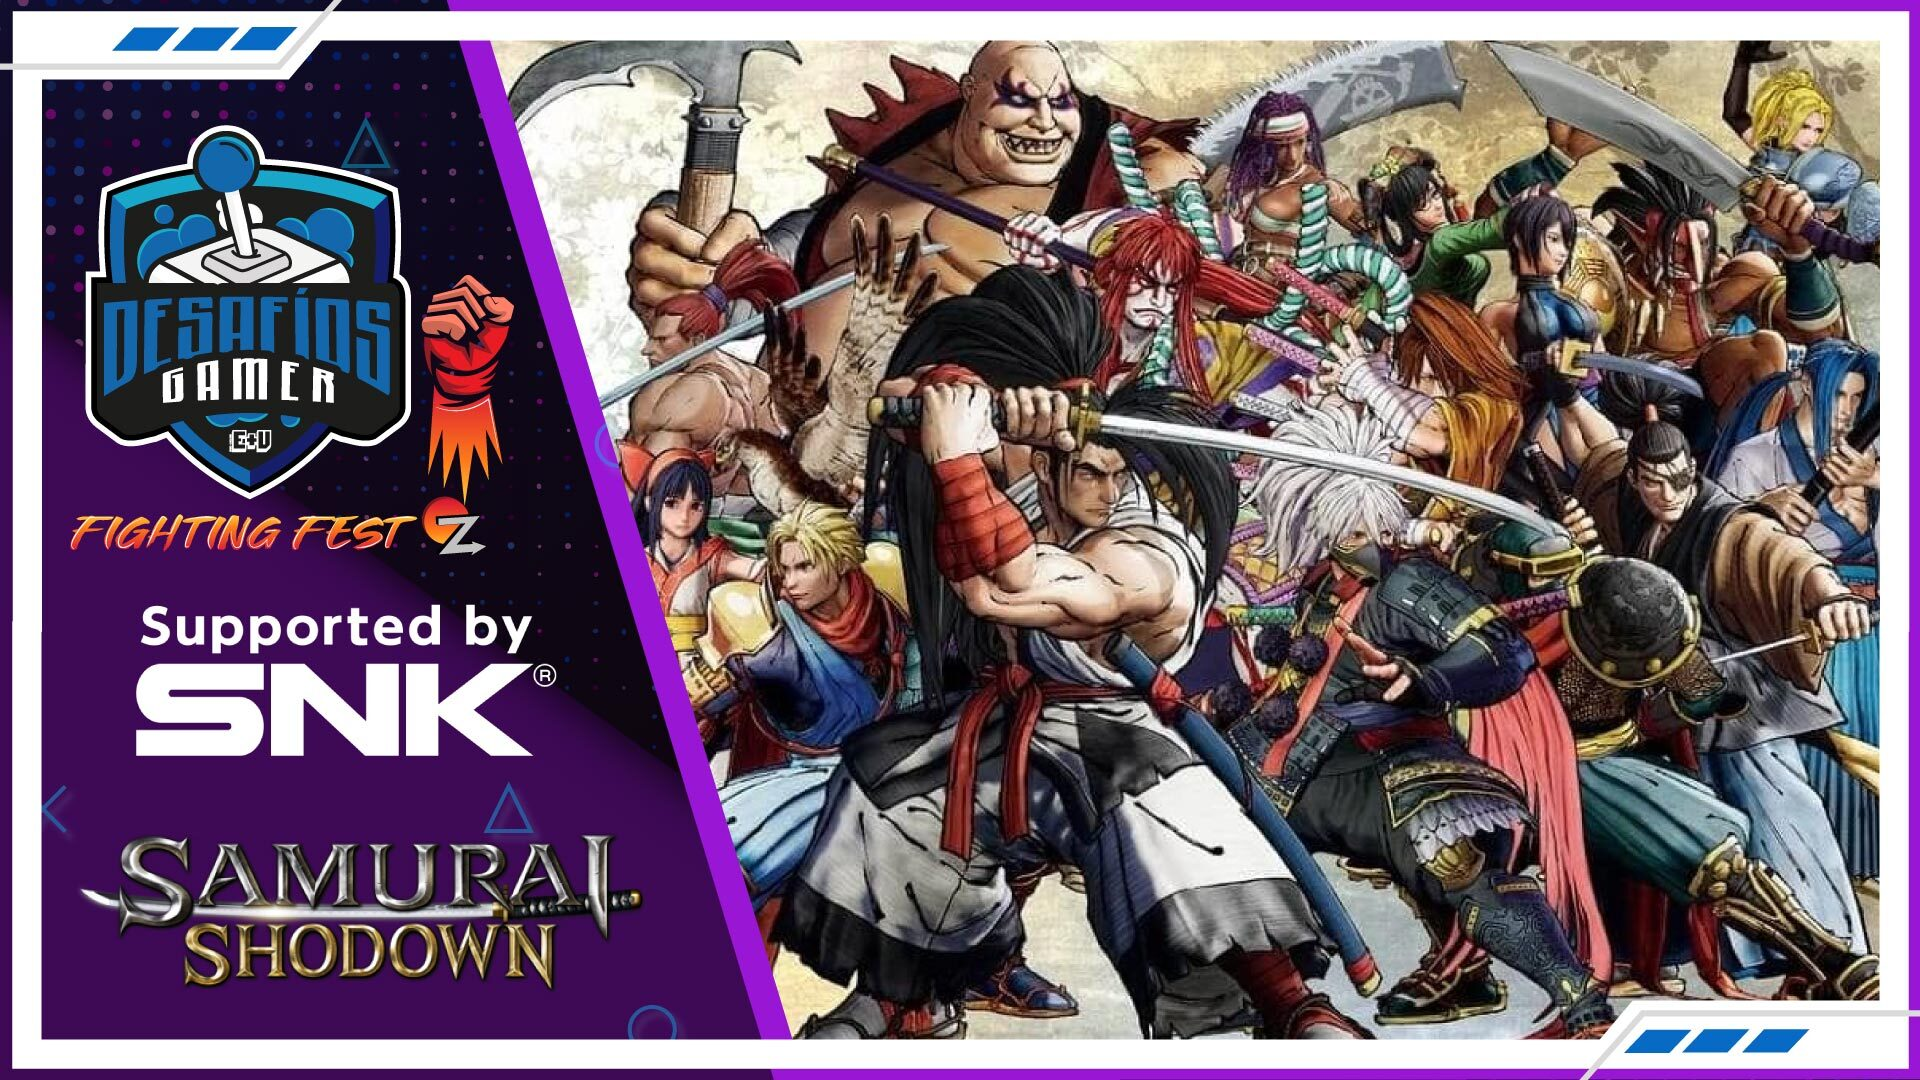 Desafíos Gamer Fighting Fest